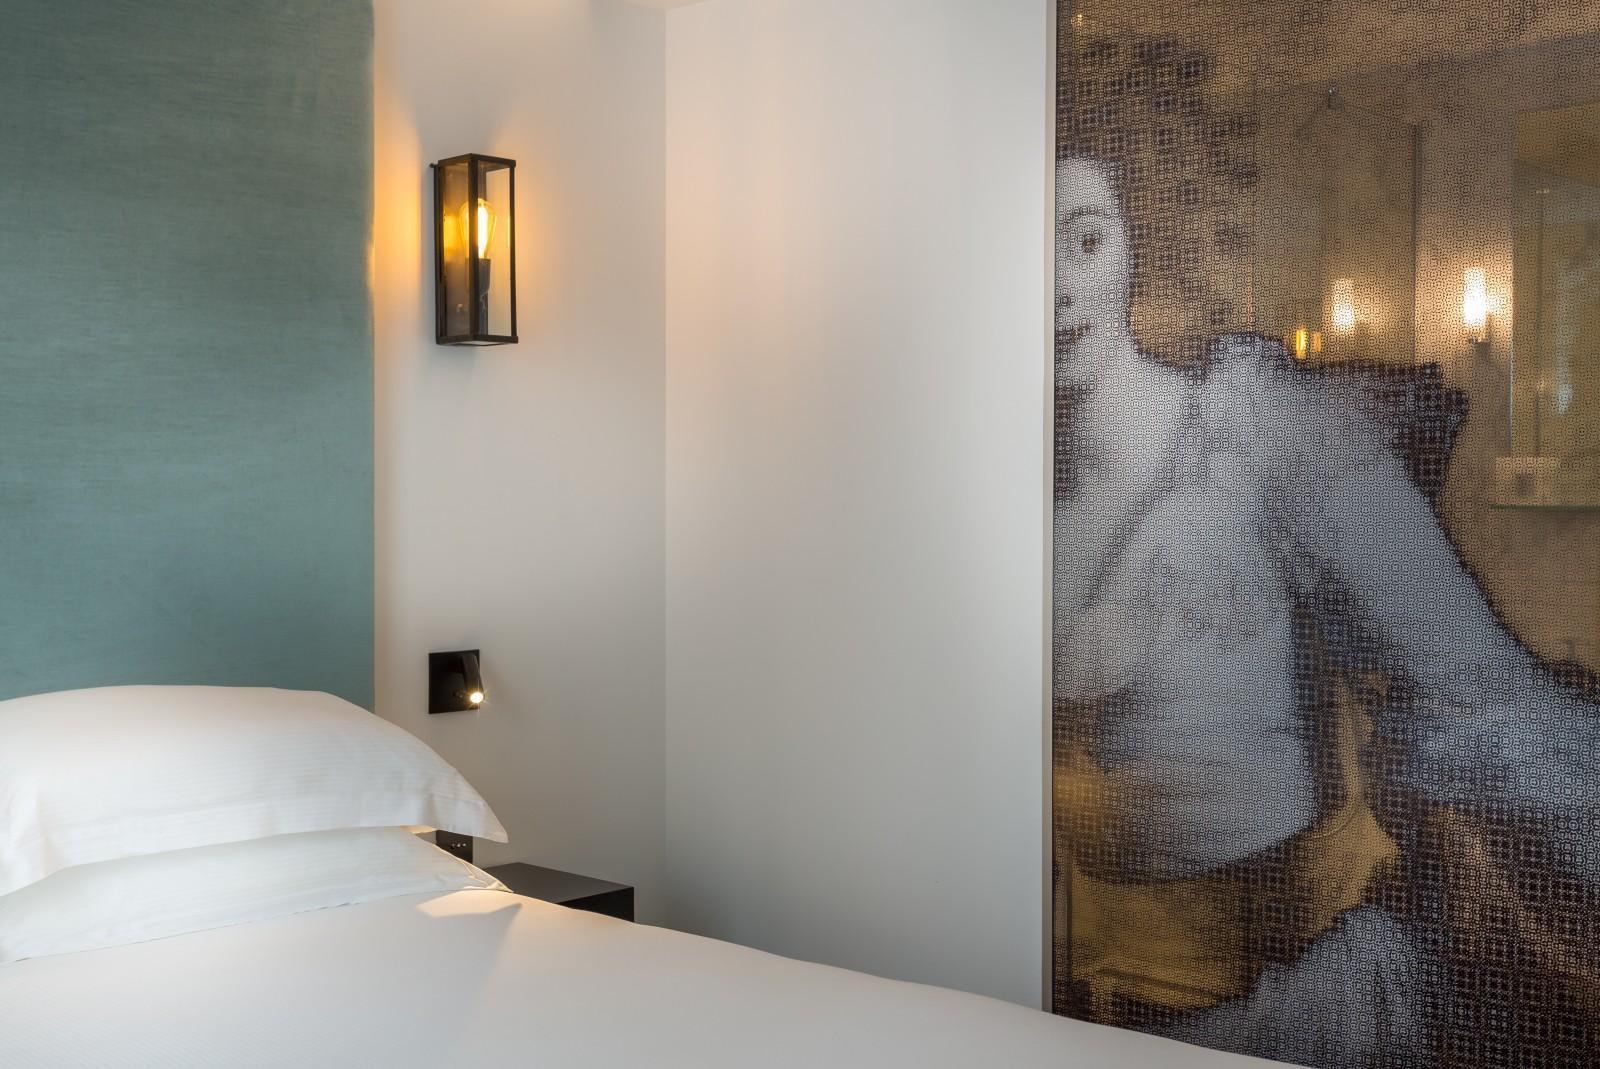 Hotel La Comtesse By Elegancia, Paris